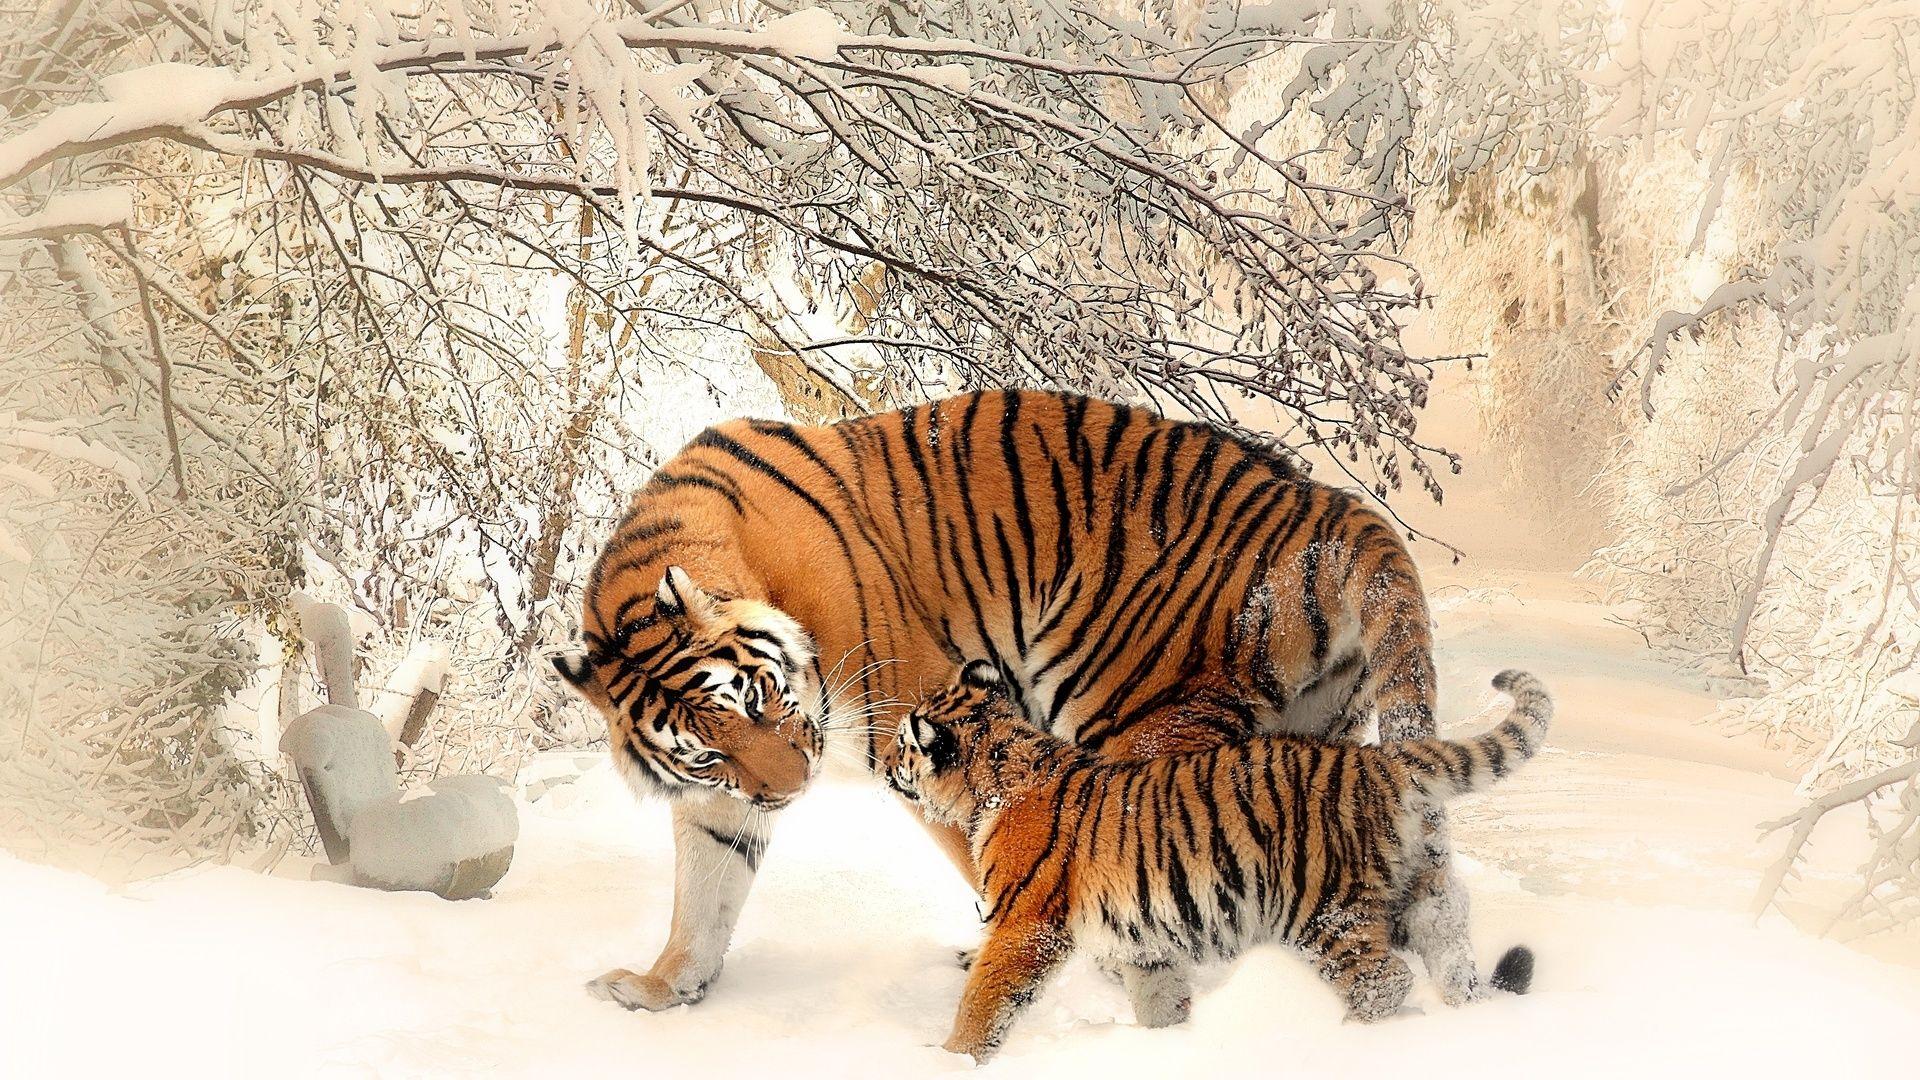 Tiger, Nice Wallpaper